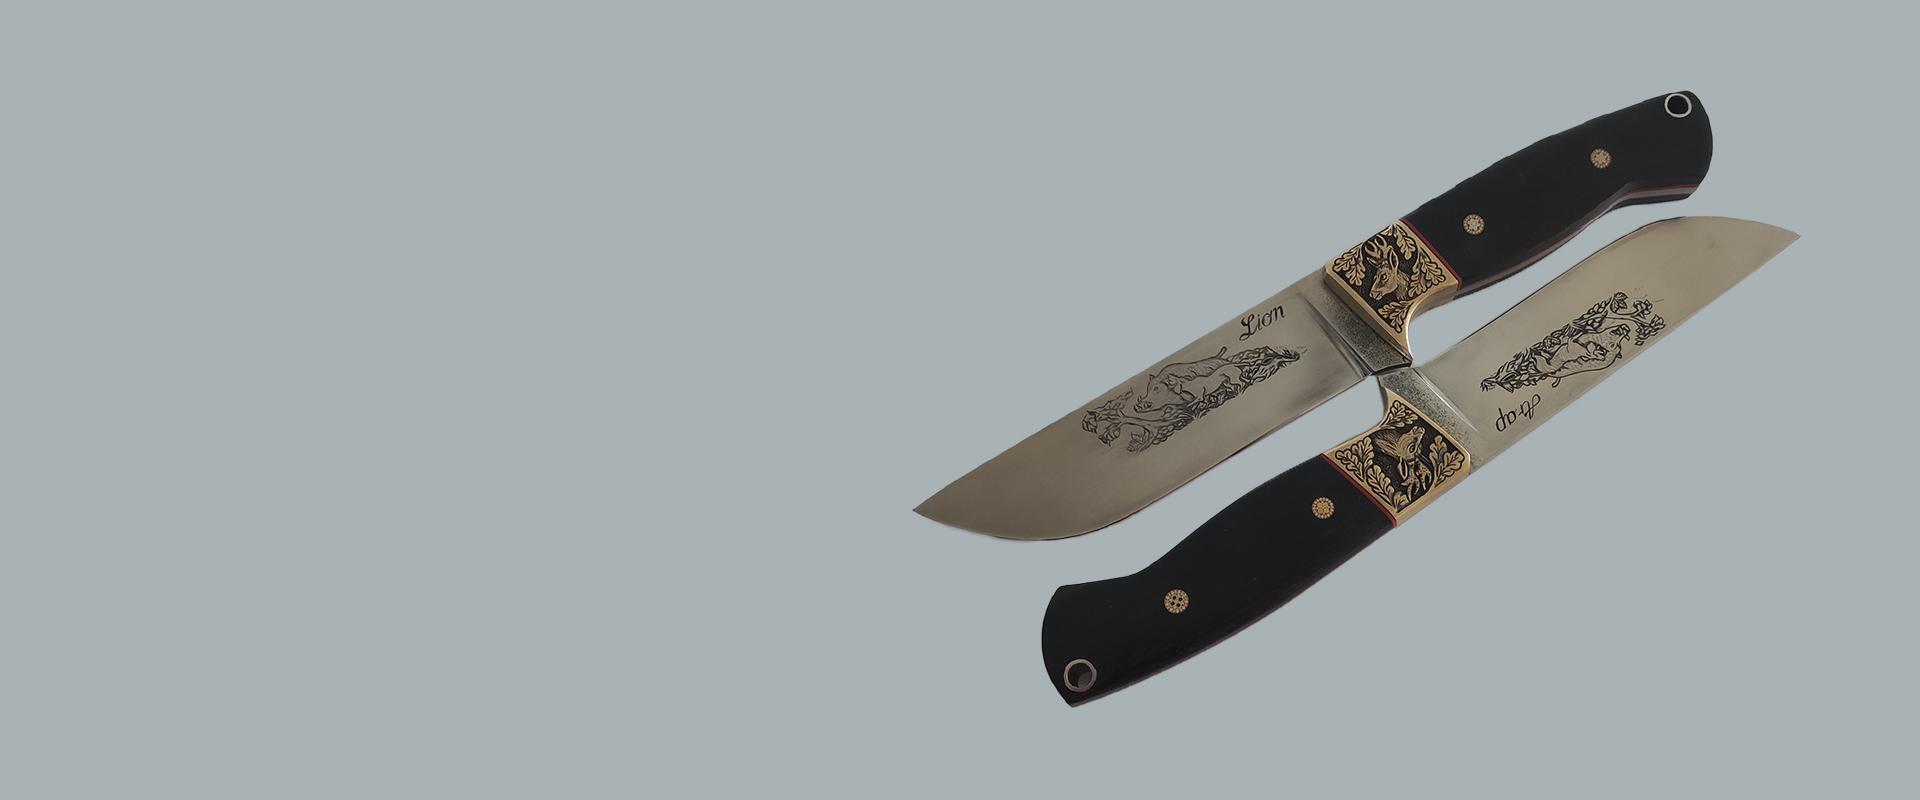 Lovački noževi